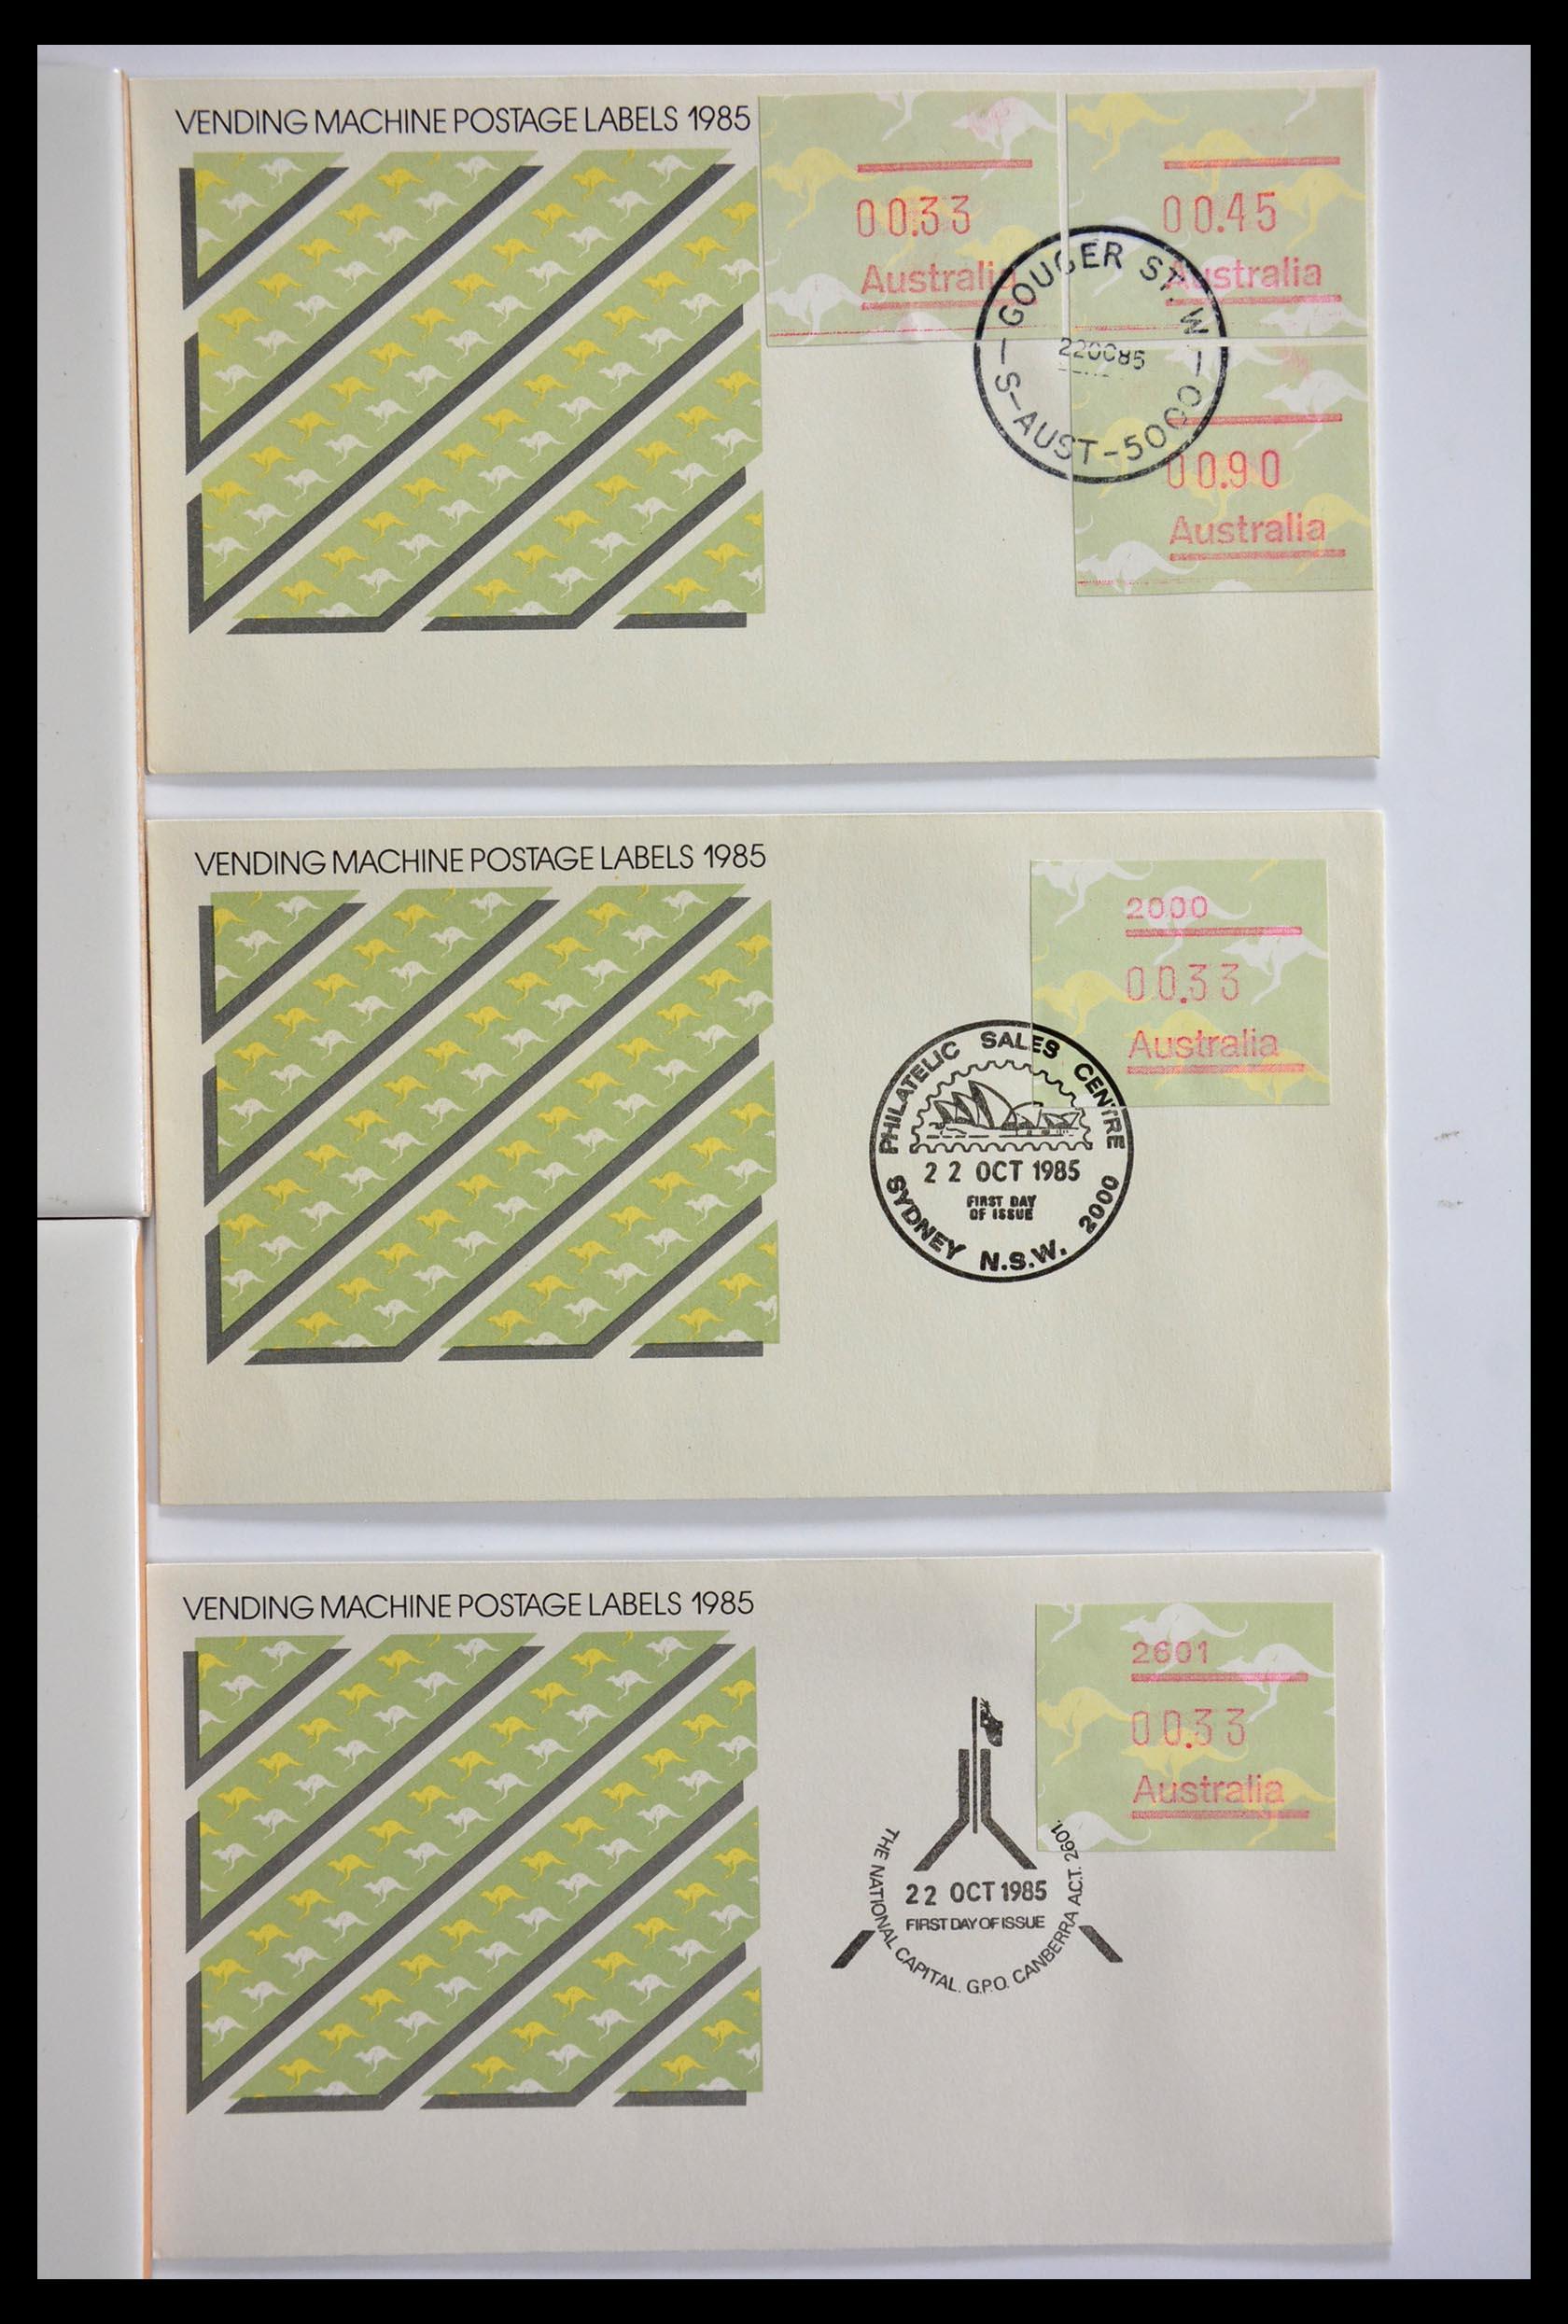 29353 002 - 29353 West Europa automaatzegels.